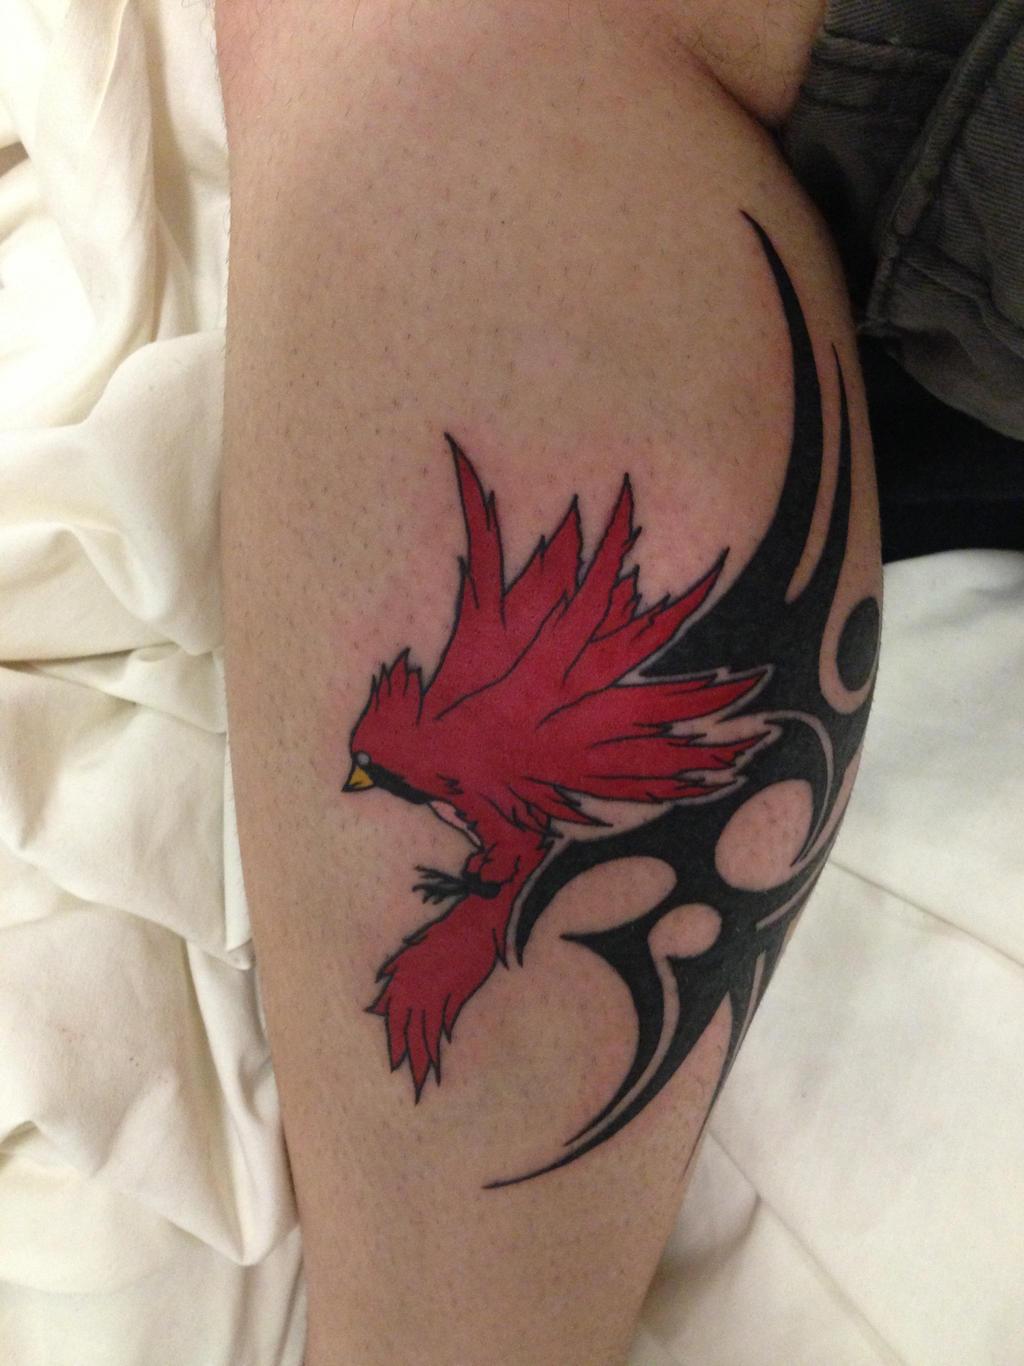 Cardinal Tattoo- on my leg by CR4ZY-CHR1S on DeviantArt